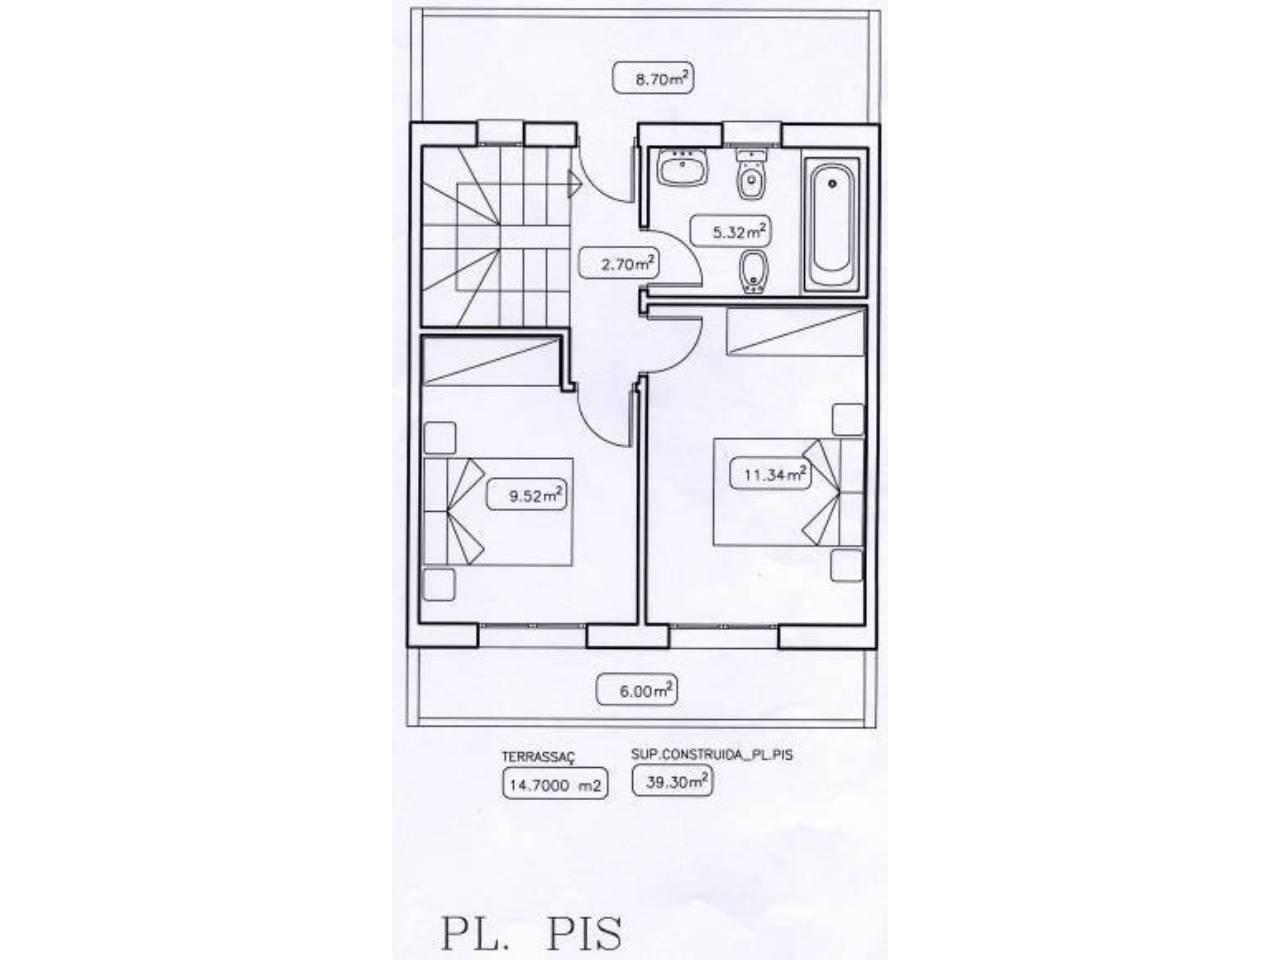 006045 - PUIGMAL Building Plot